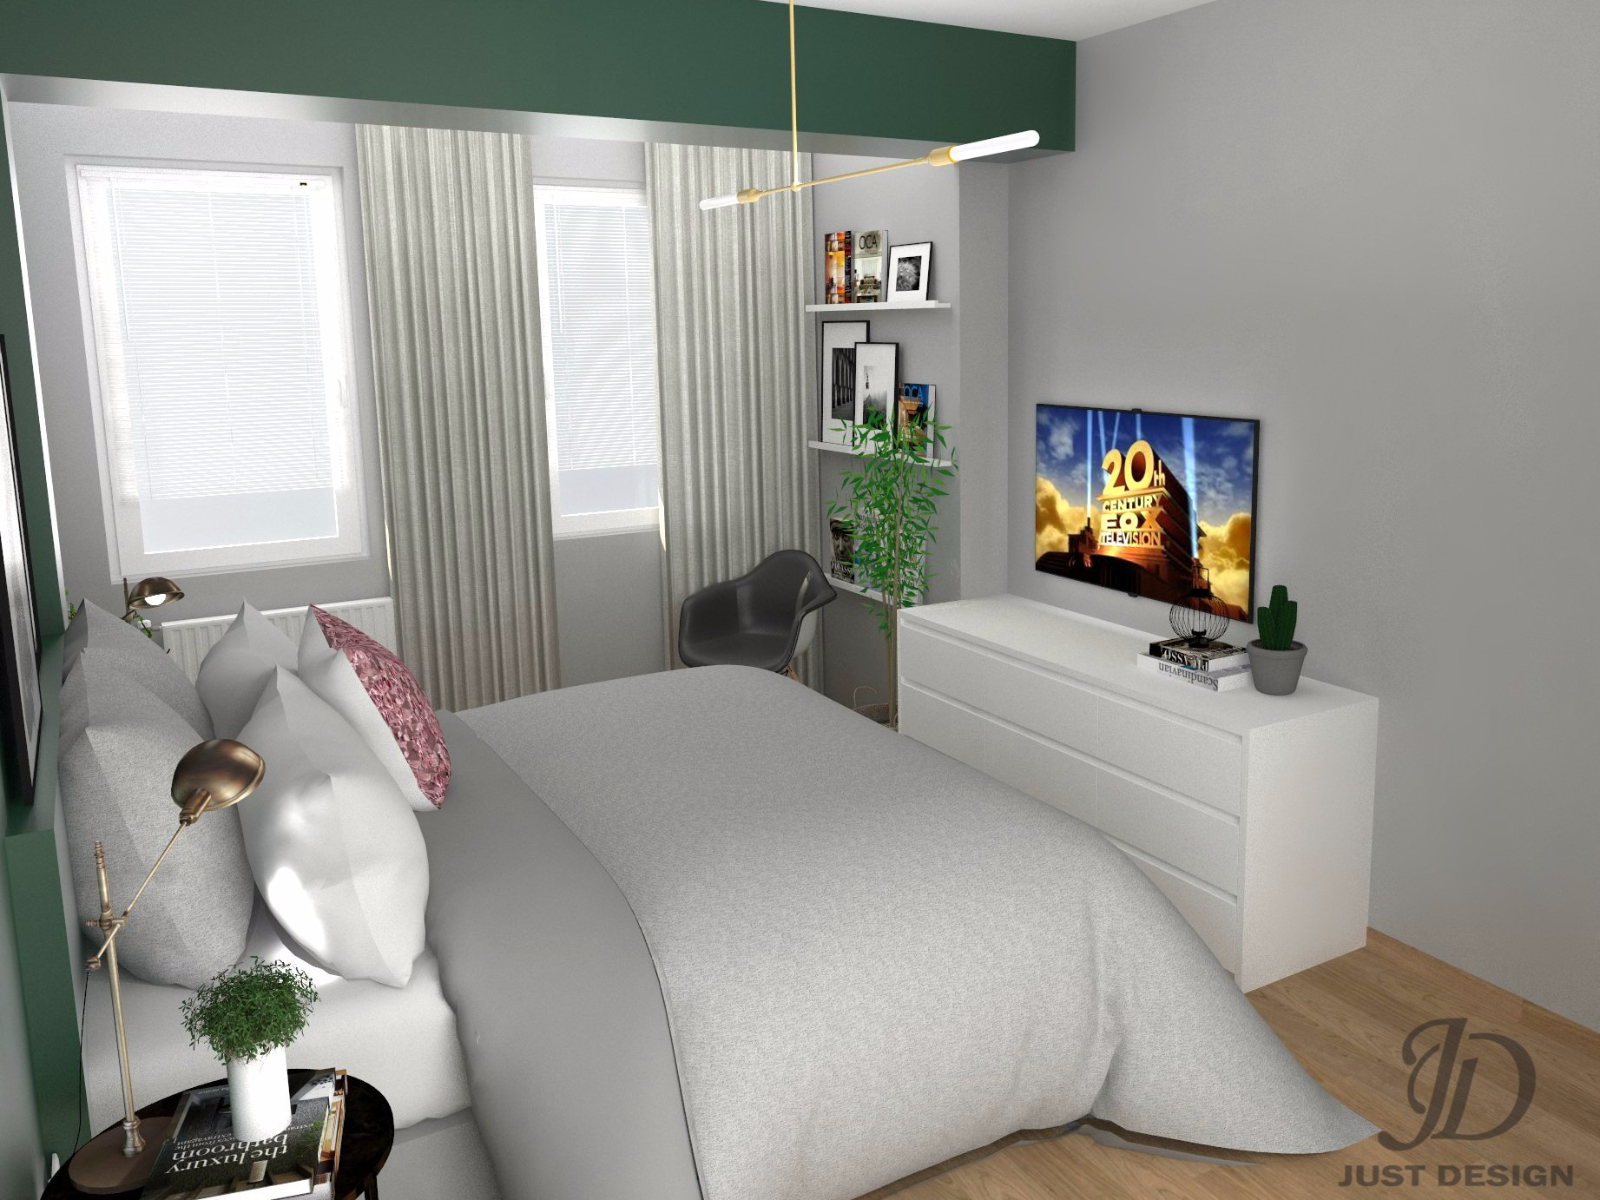 vnatresno ureduvanje na spalna soba